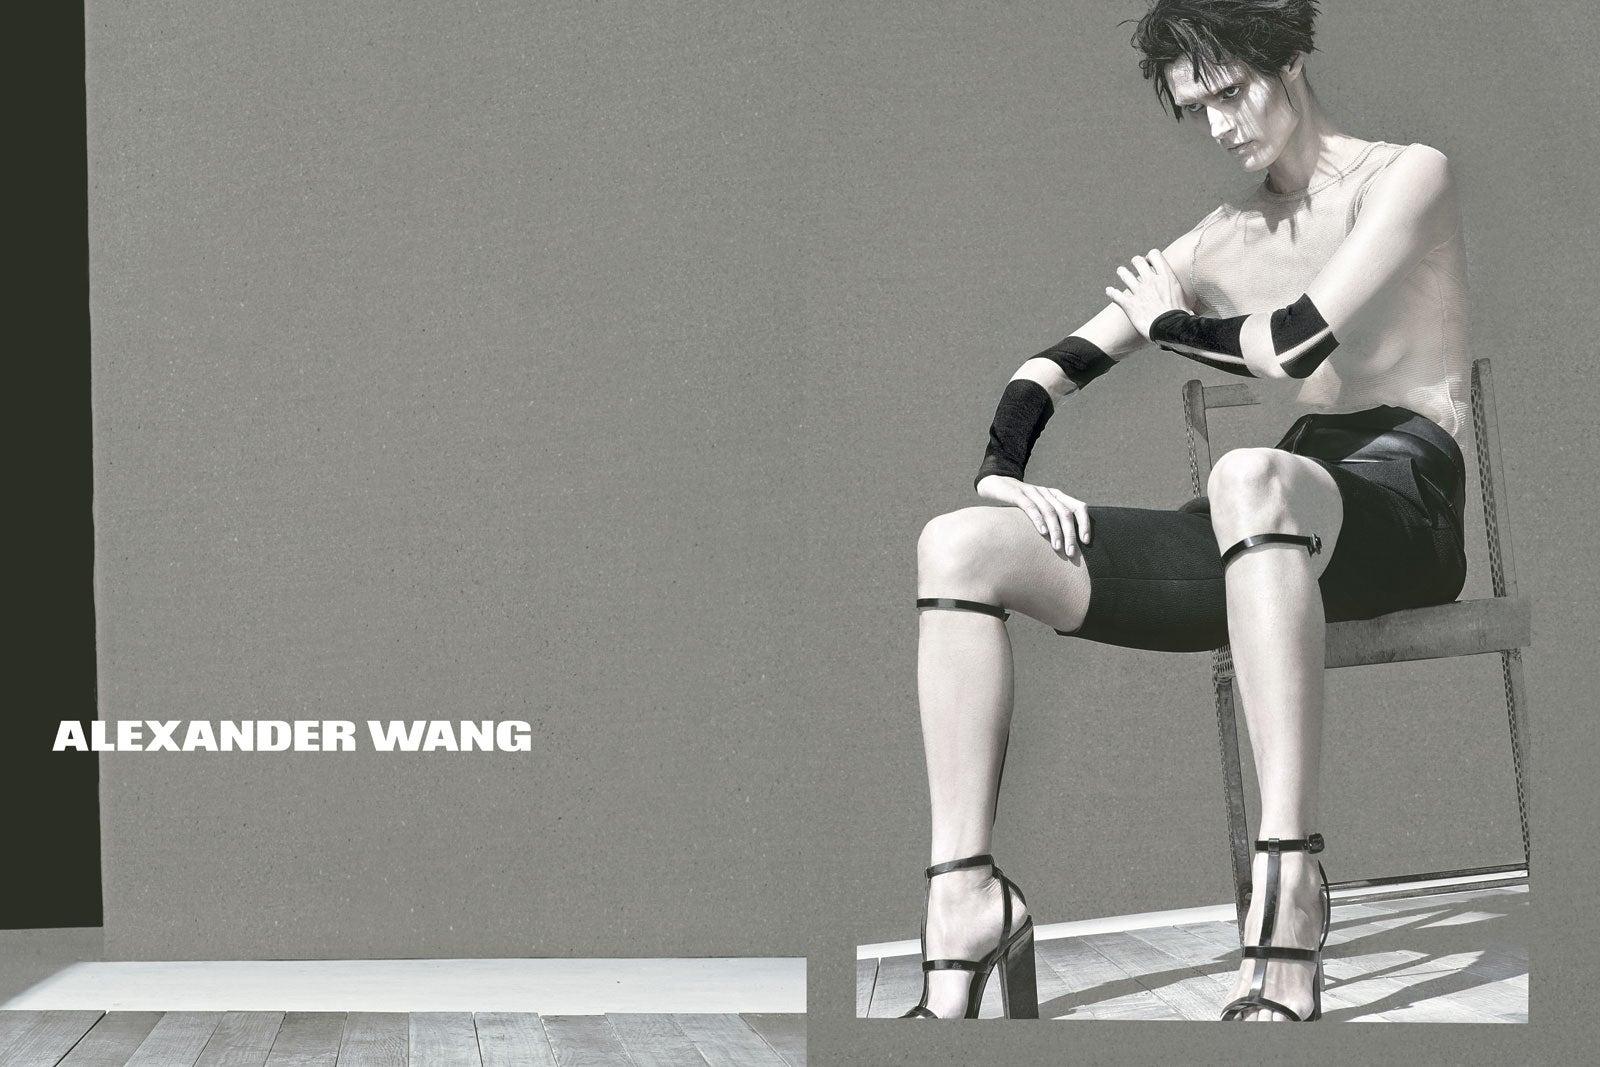 alexander wang spring campaign photo courtesy of alexander wang